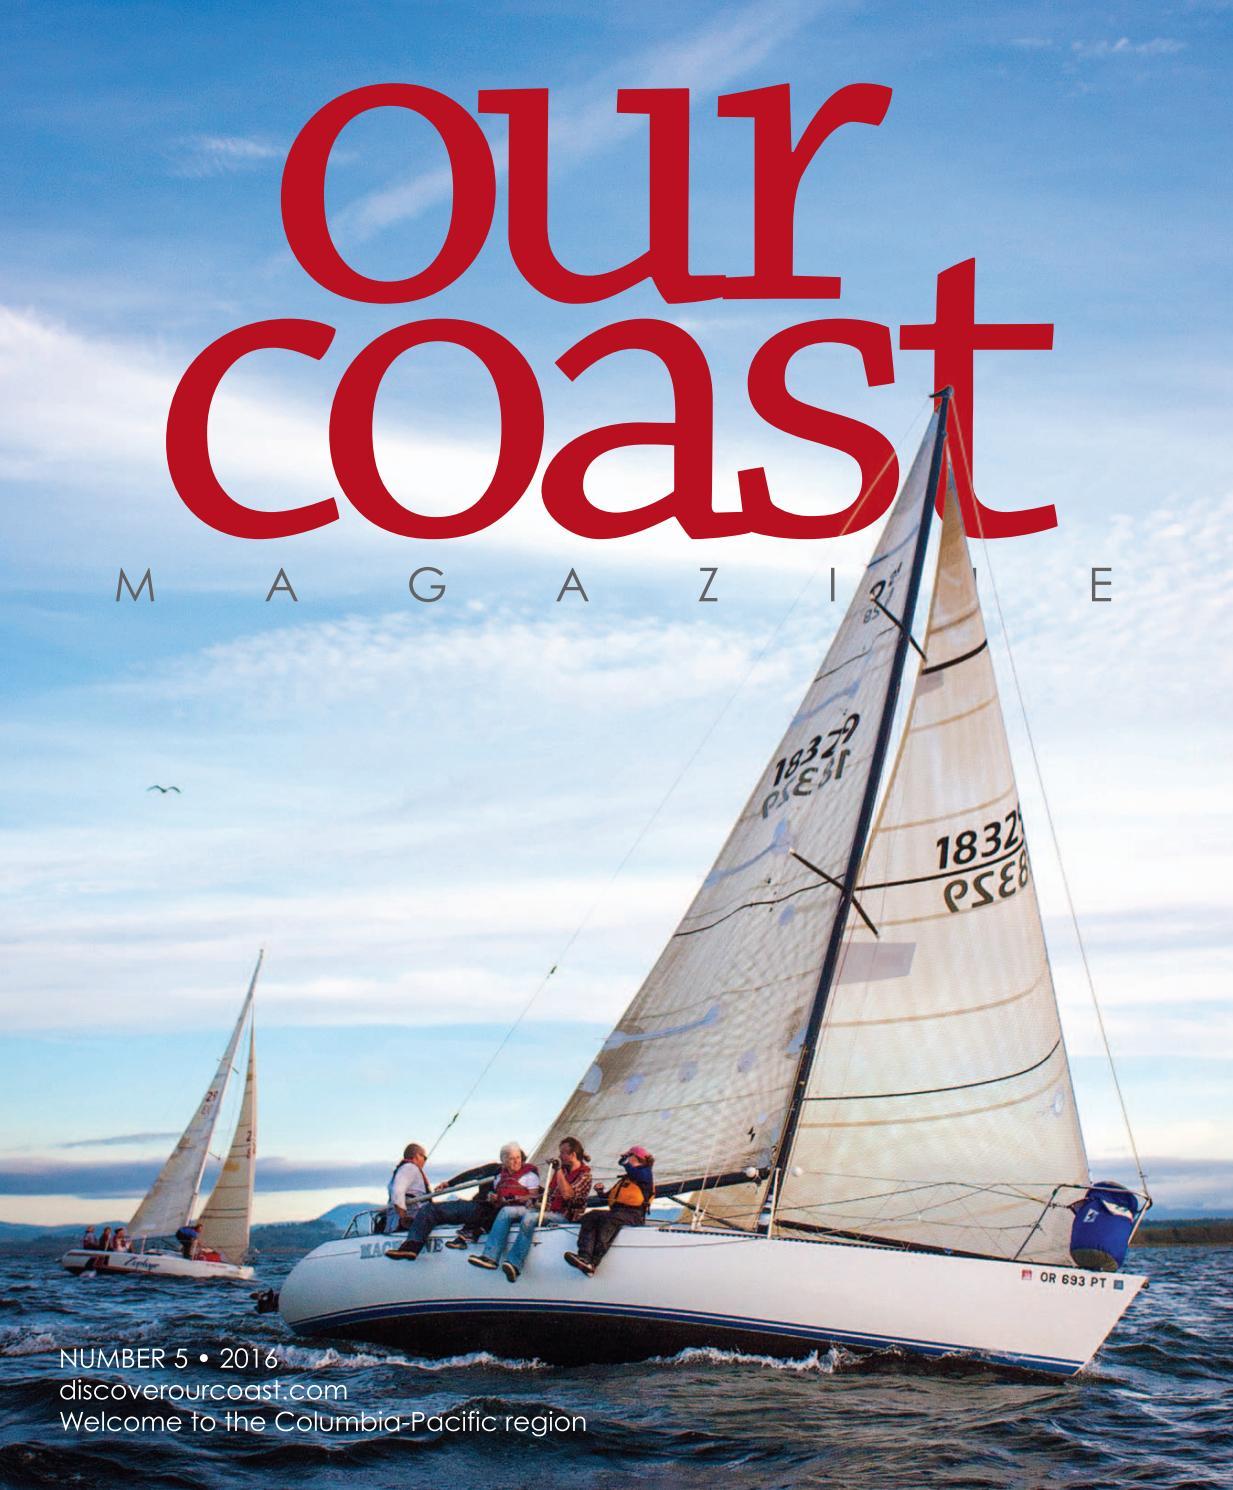 Our Coast Magazine 2016 by Our Coast - issuu